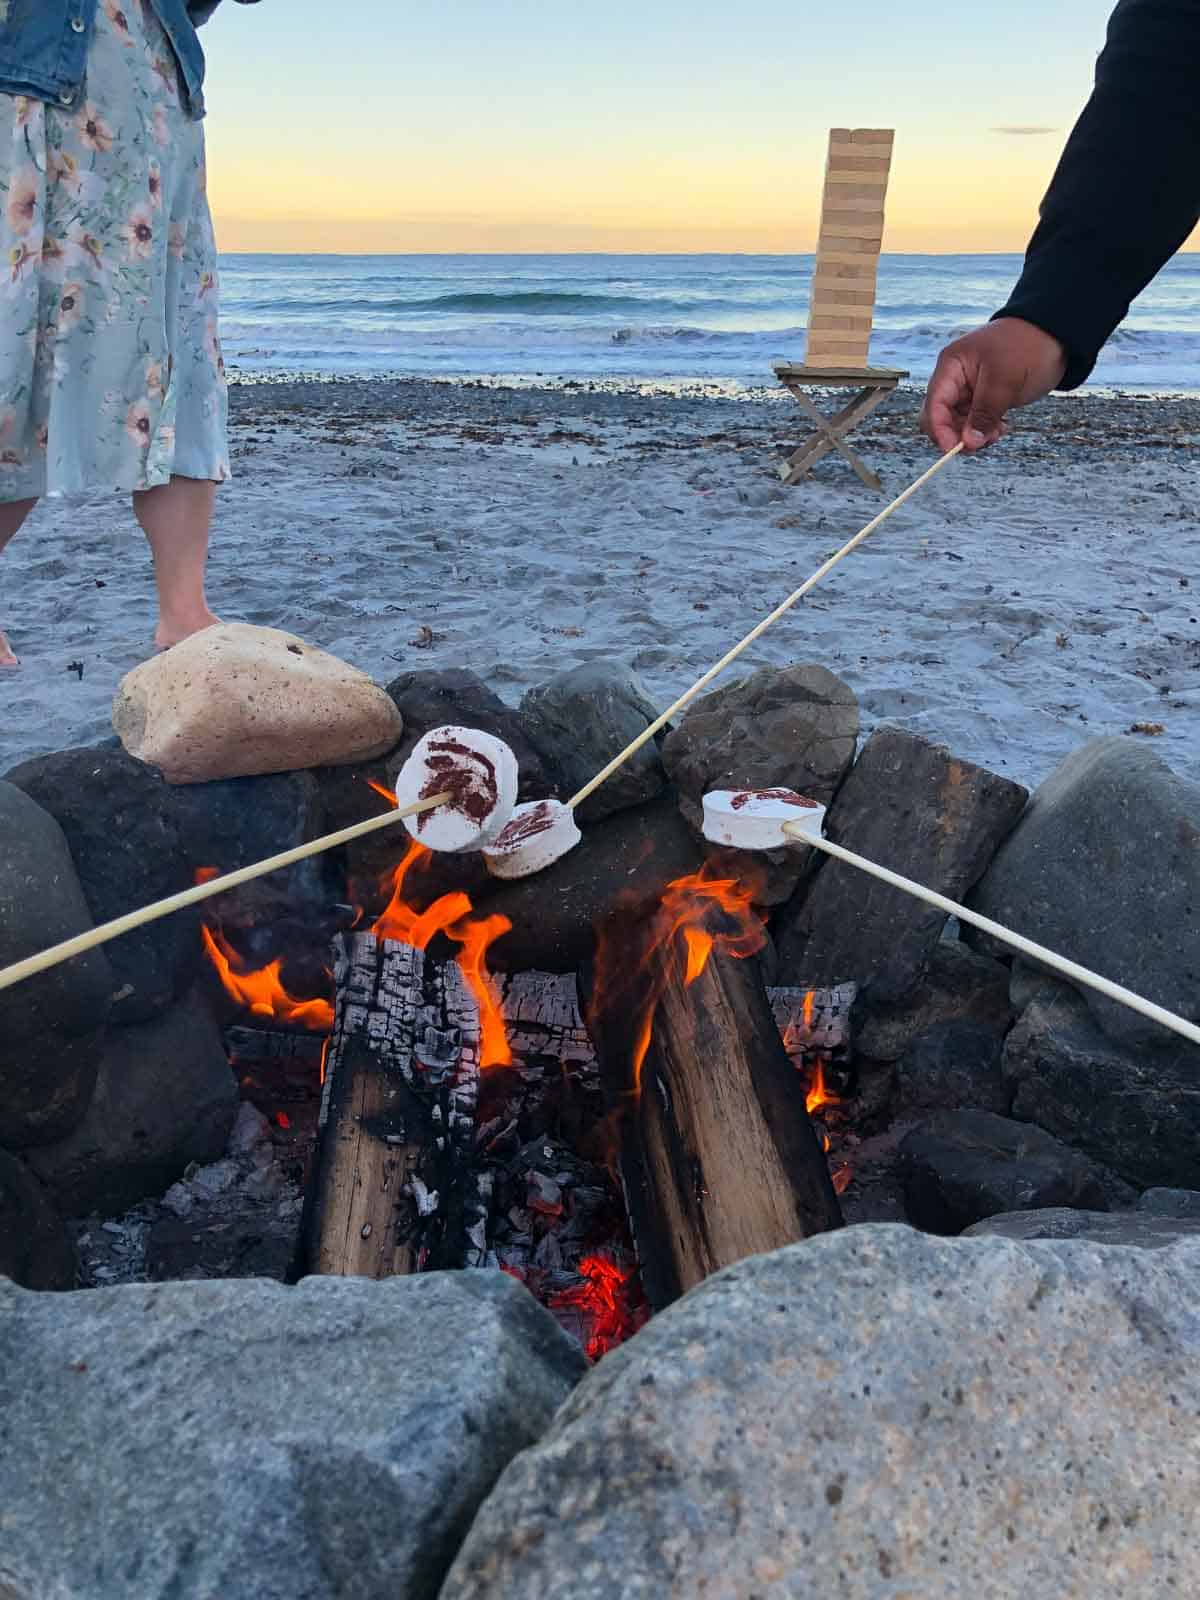 roasting marshmallows over a bonfire